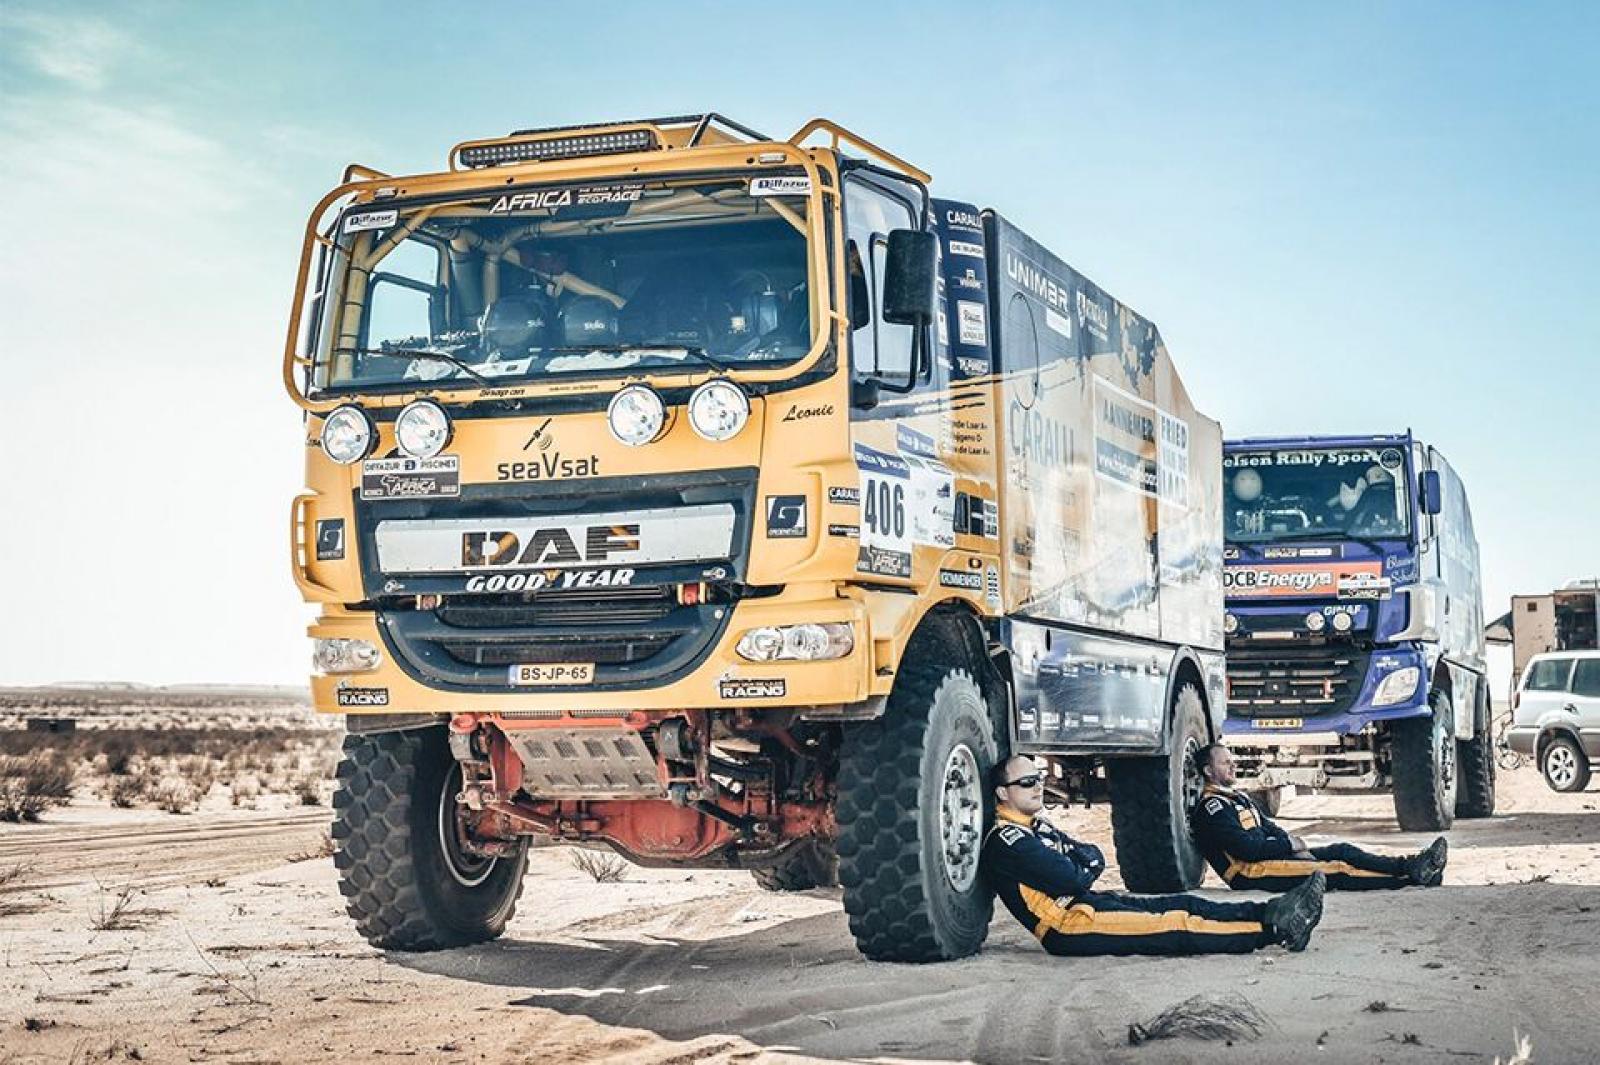 DAF Rally truck 2019 - 1